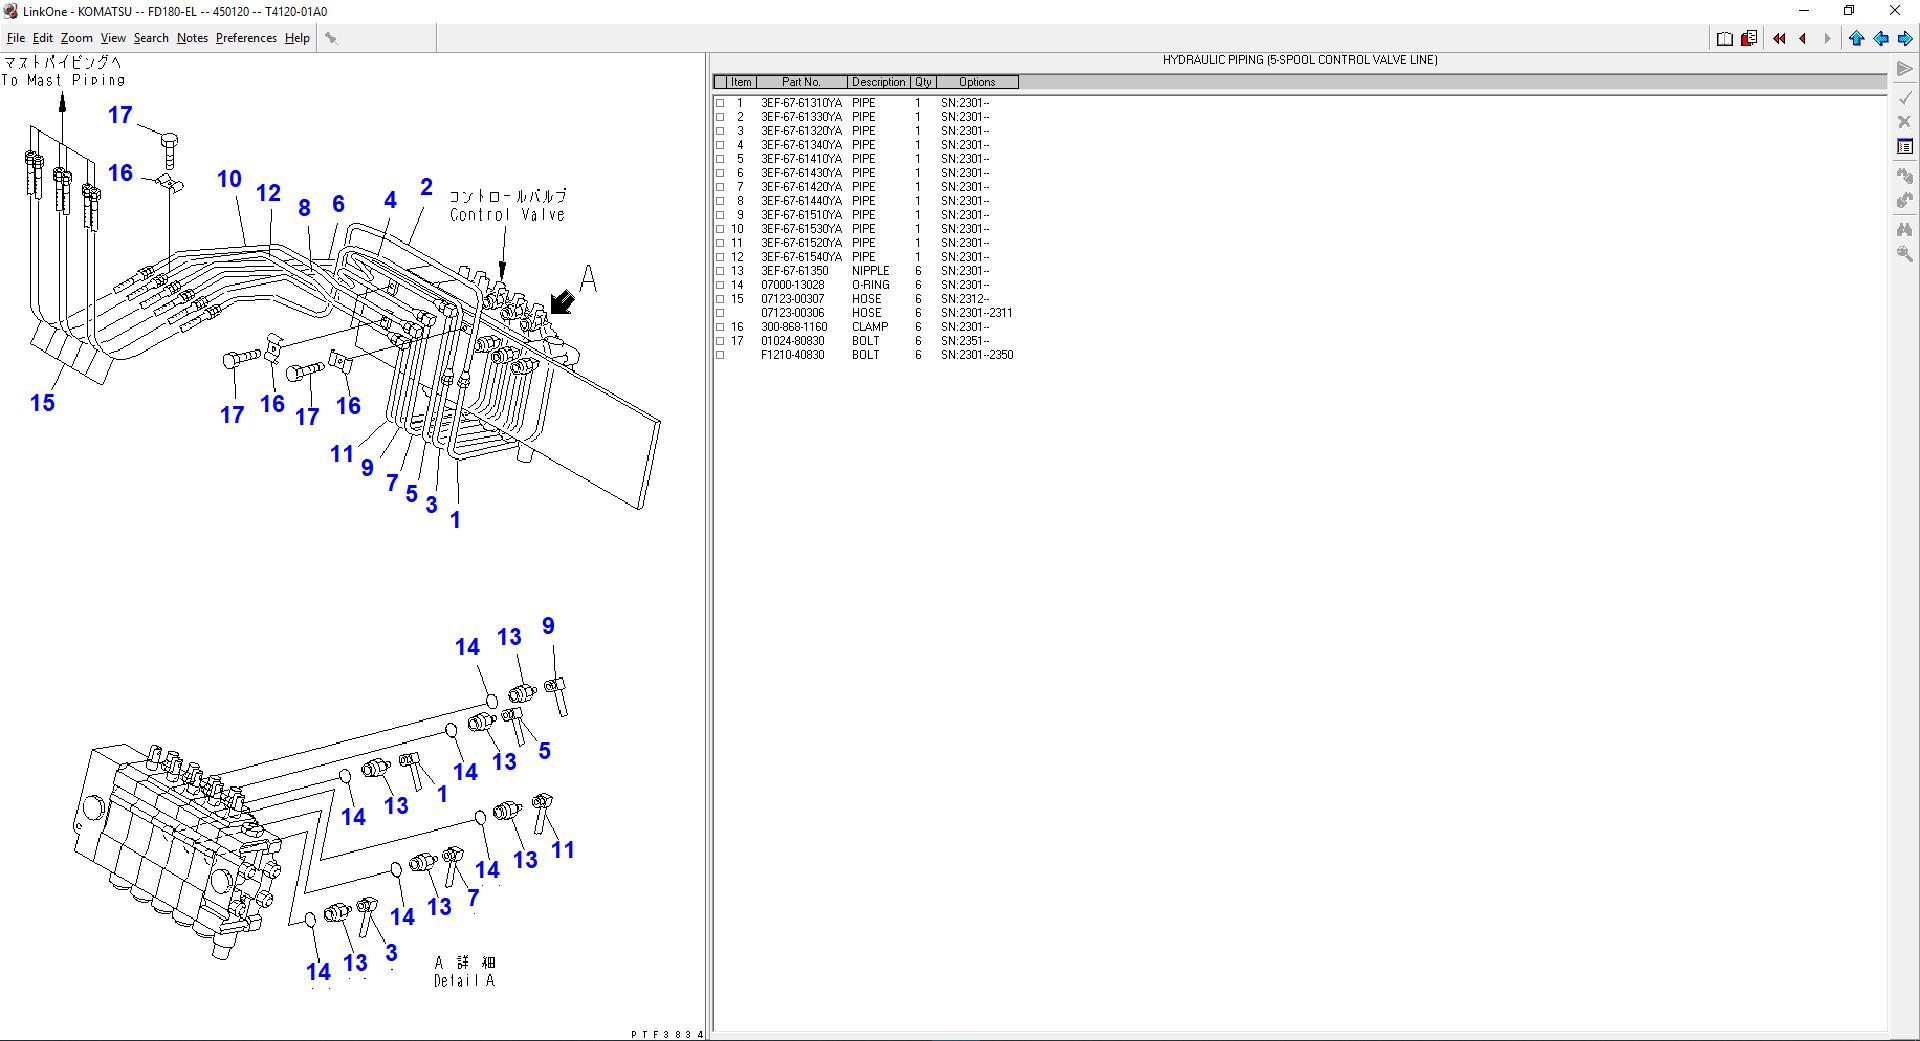 Komatsu_Forklift_Link_One_112012_Spare_Parts_Catalog8